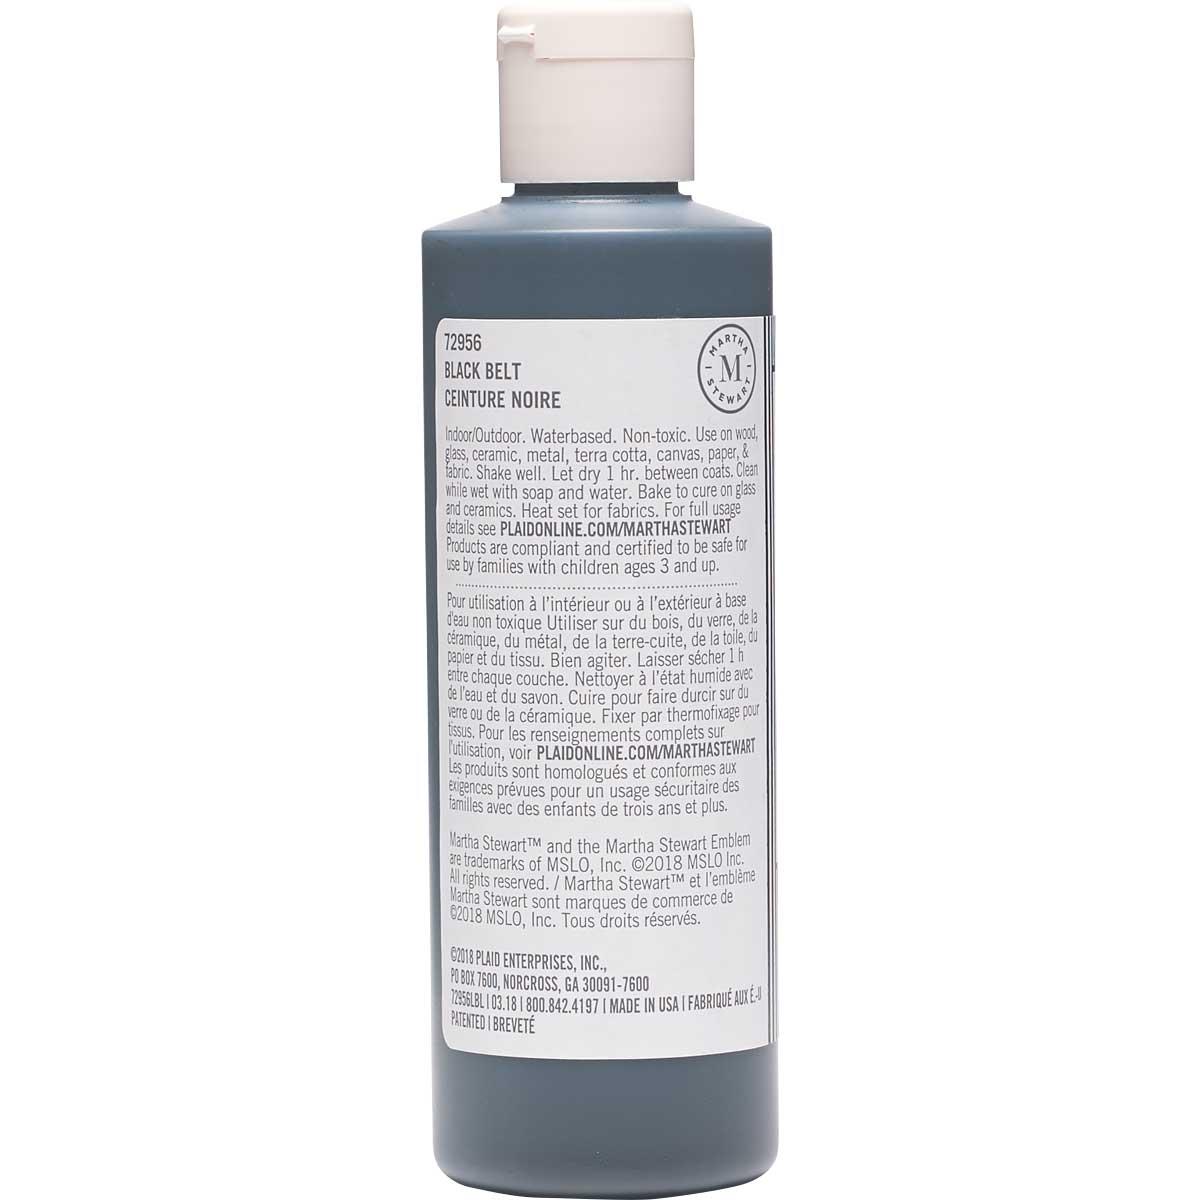 Martha Stewart ® Multi-Surface Satin Acrylic Craft Paint CPSIA - Black Belt, 8 oz. - 72956